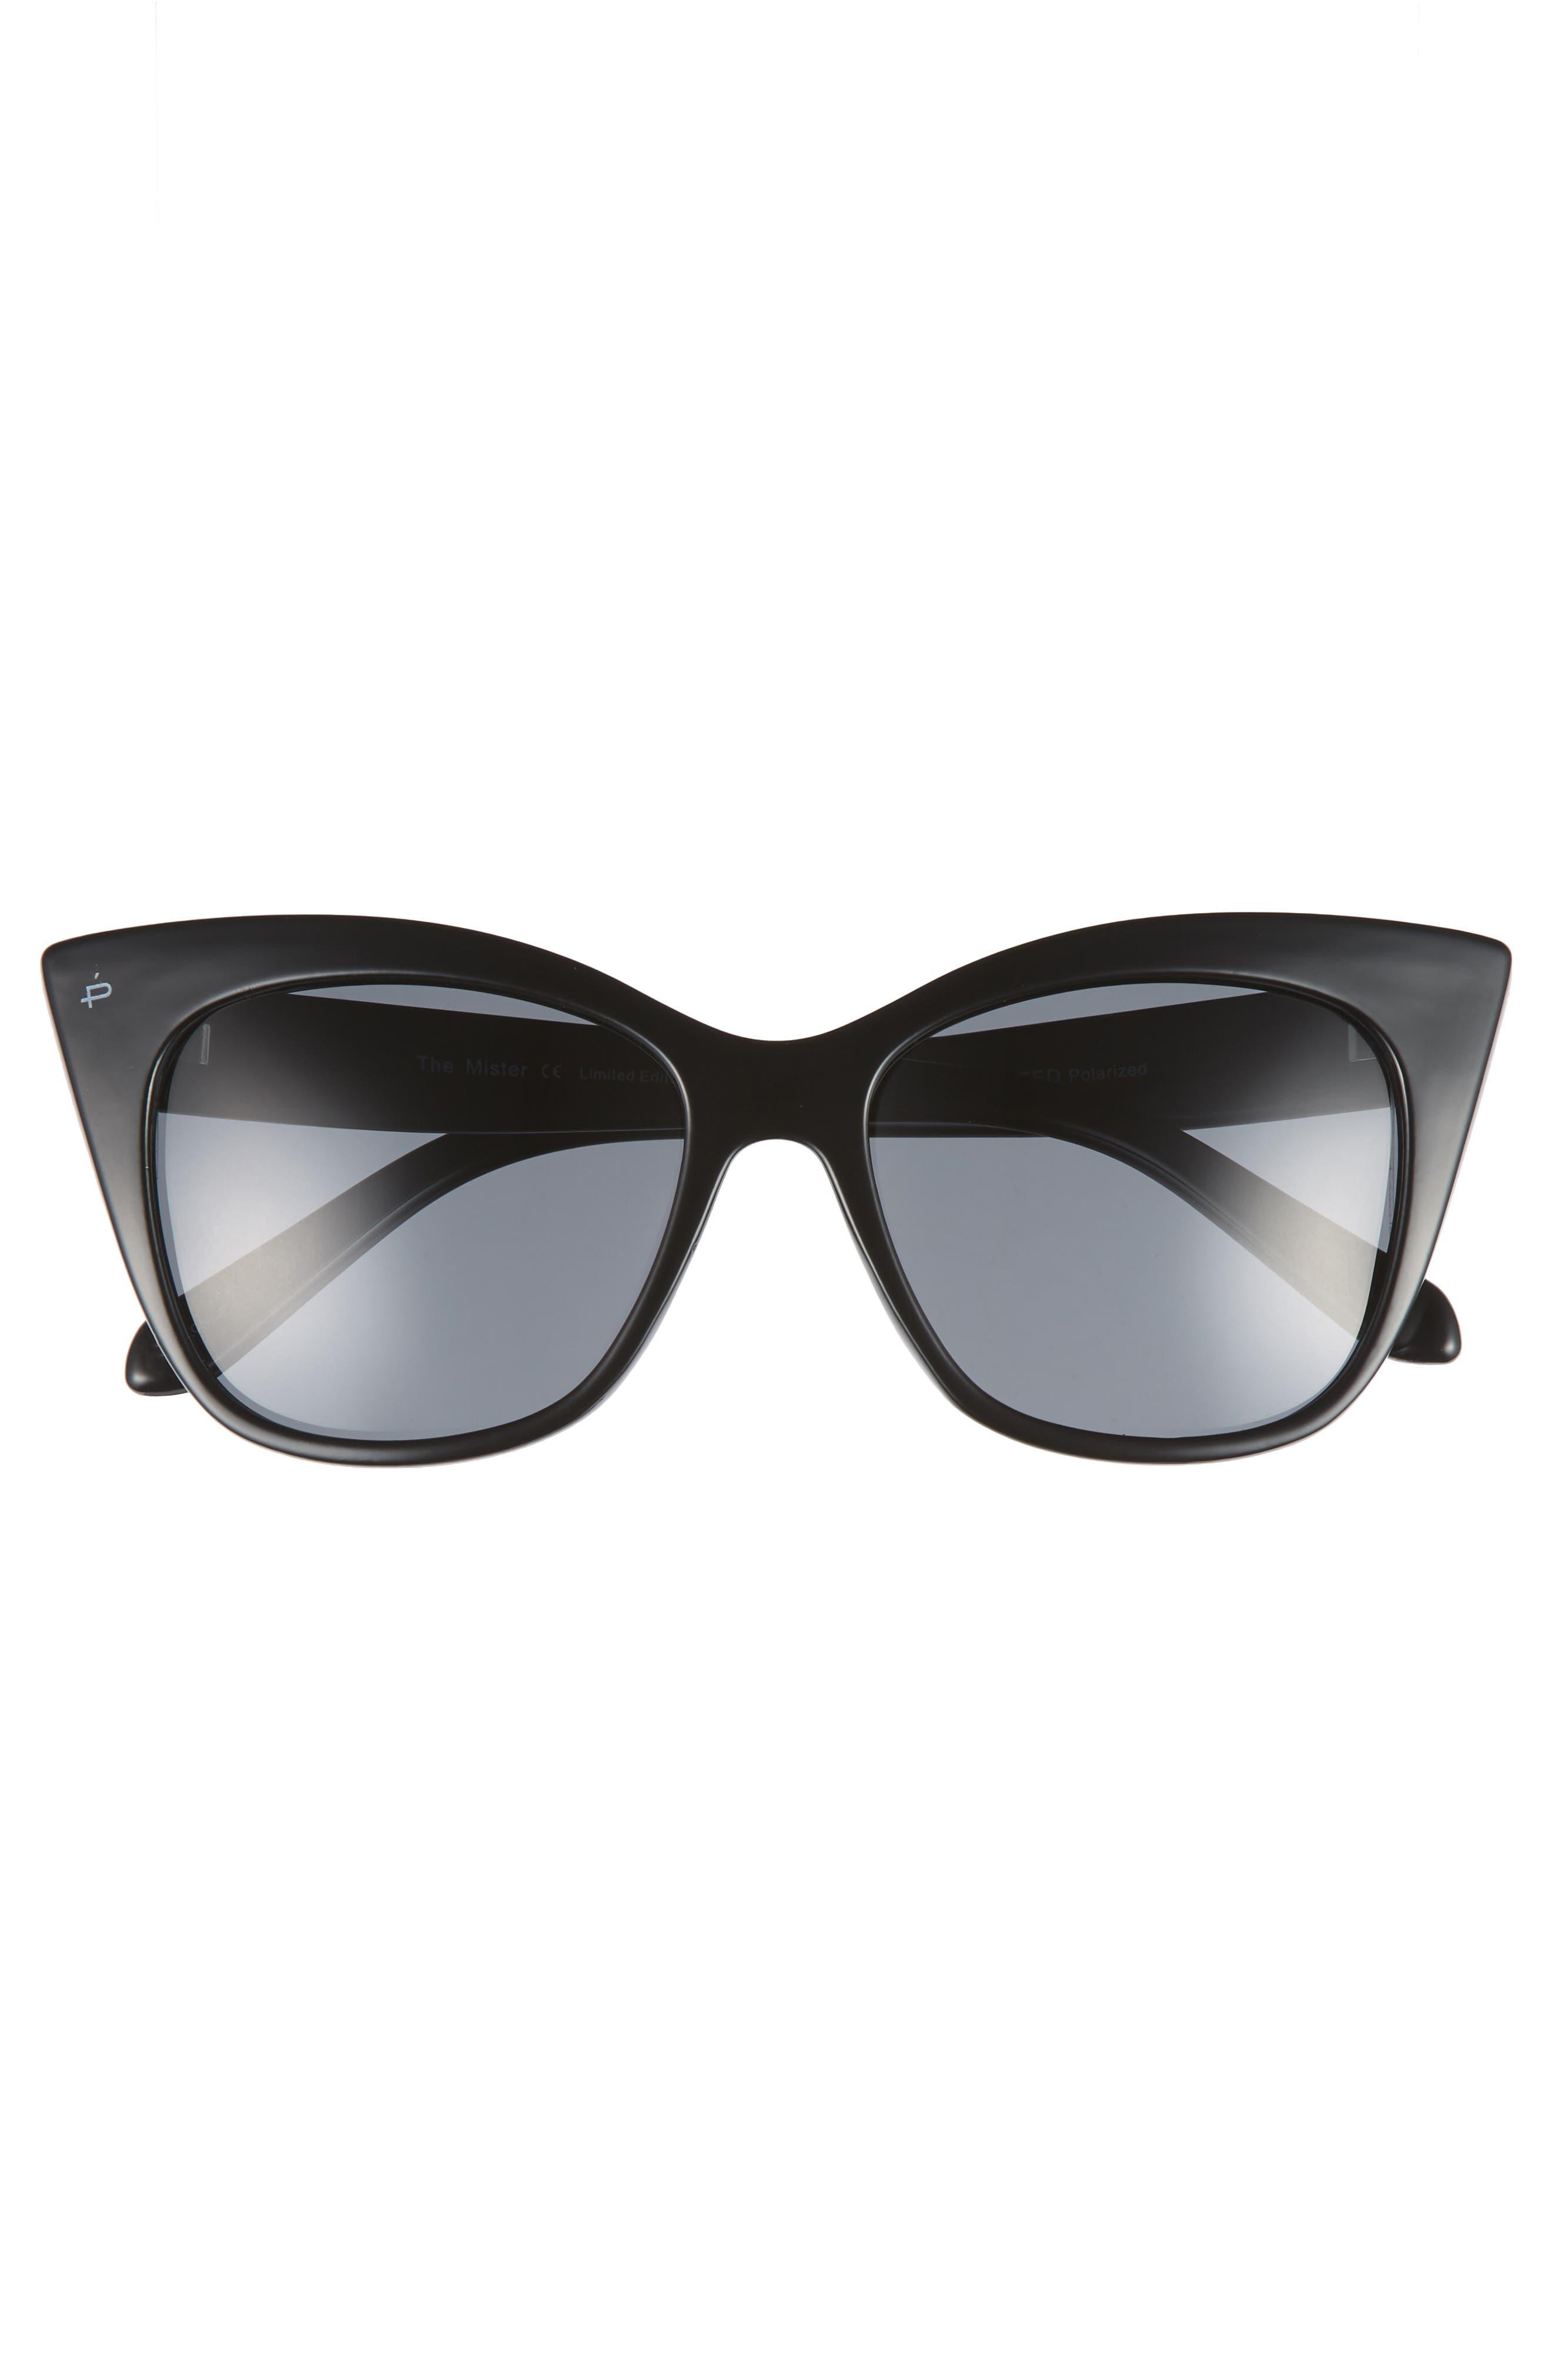 Privé Revaux x Madelaine Petsch The Mister 54mm Cat Eye Sunglasses,                             Alternate thumbnail 4, color,                             Black/ Black